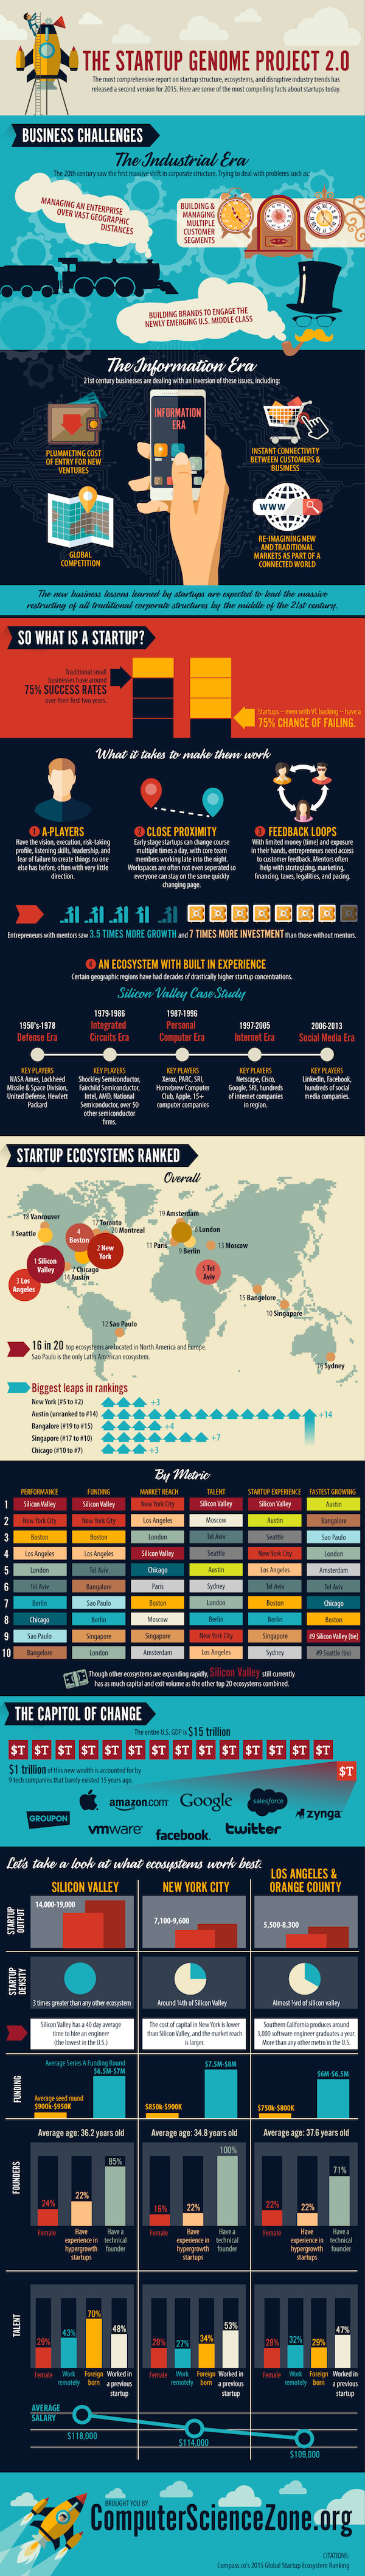 Startup-Genome 2.0 infographic